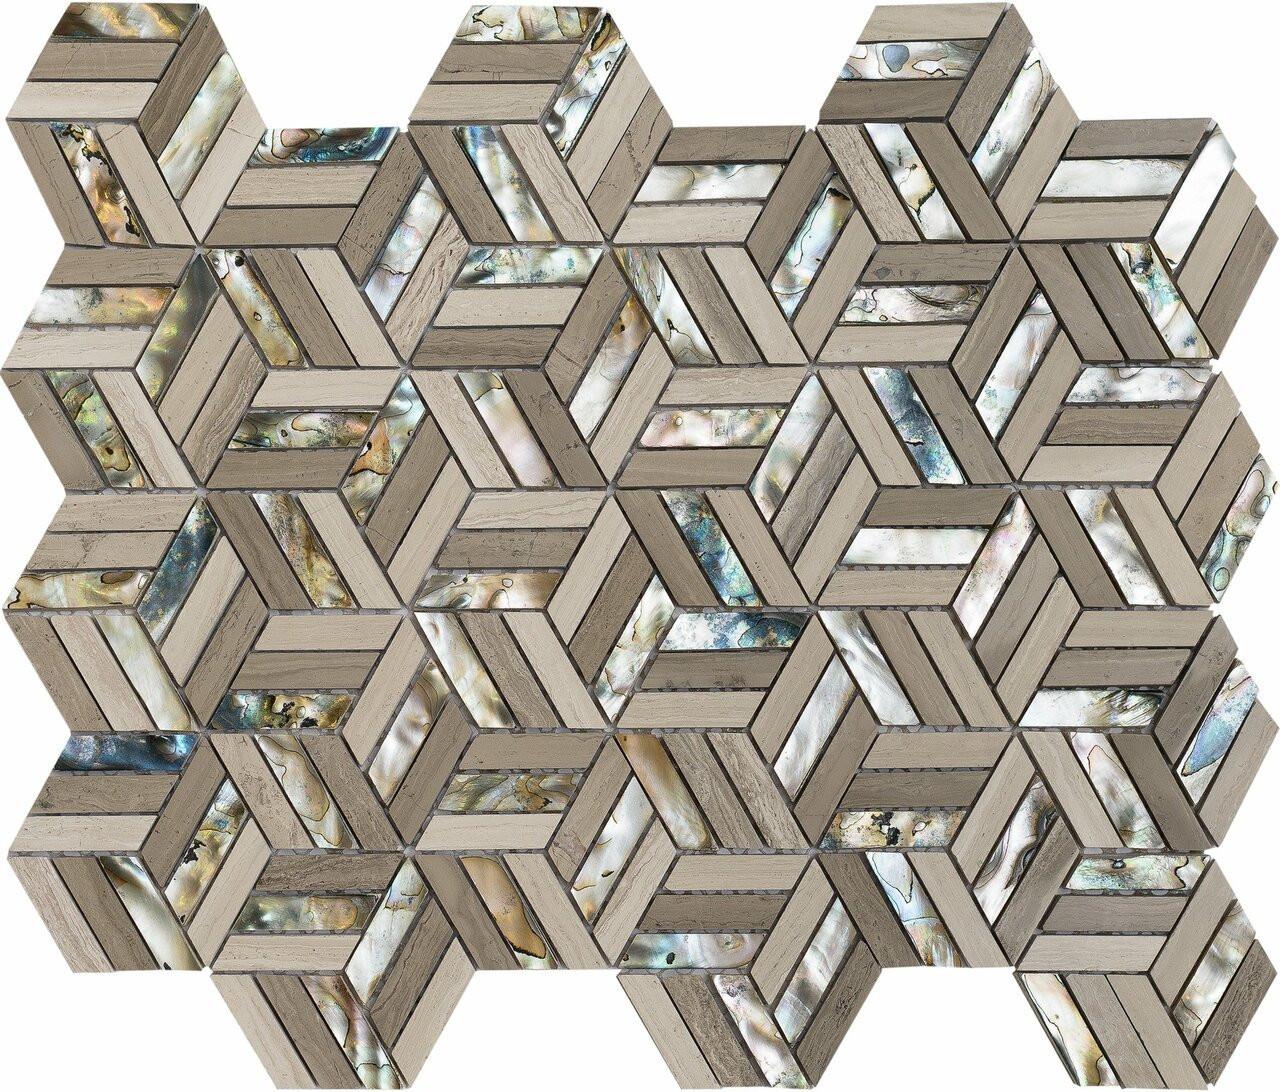 UBC North Shore Series Black Sand Beach Hexagon 540-536